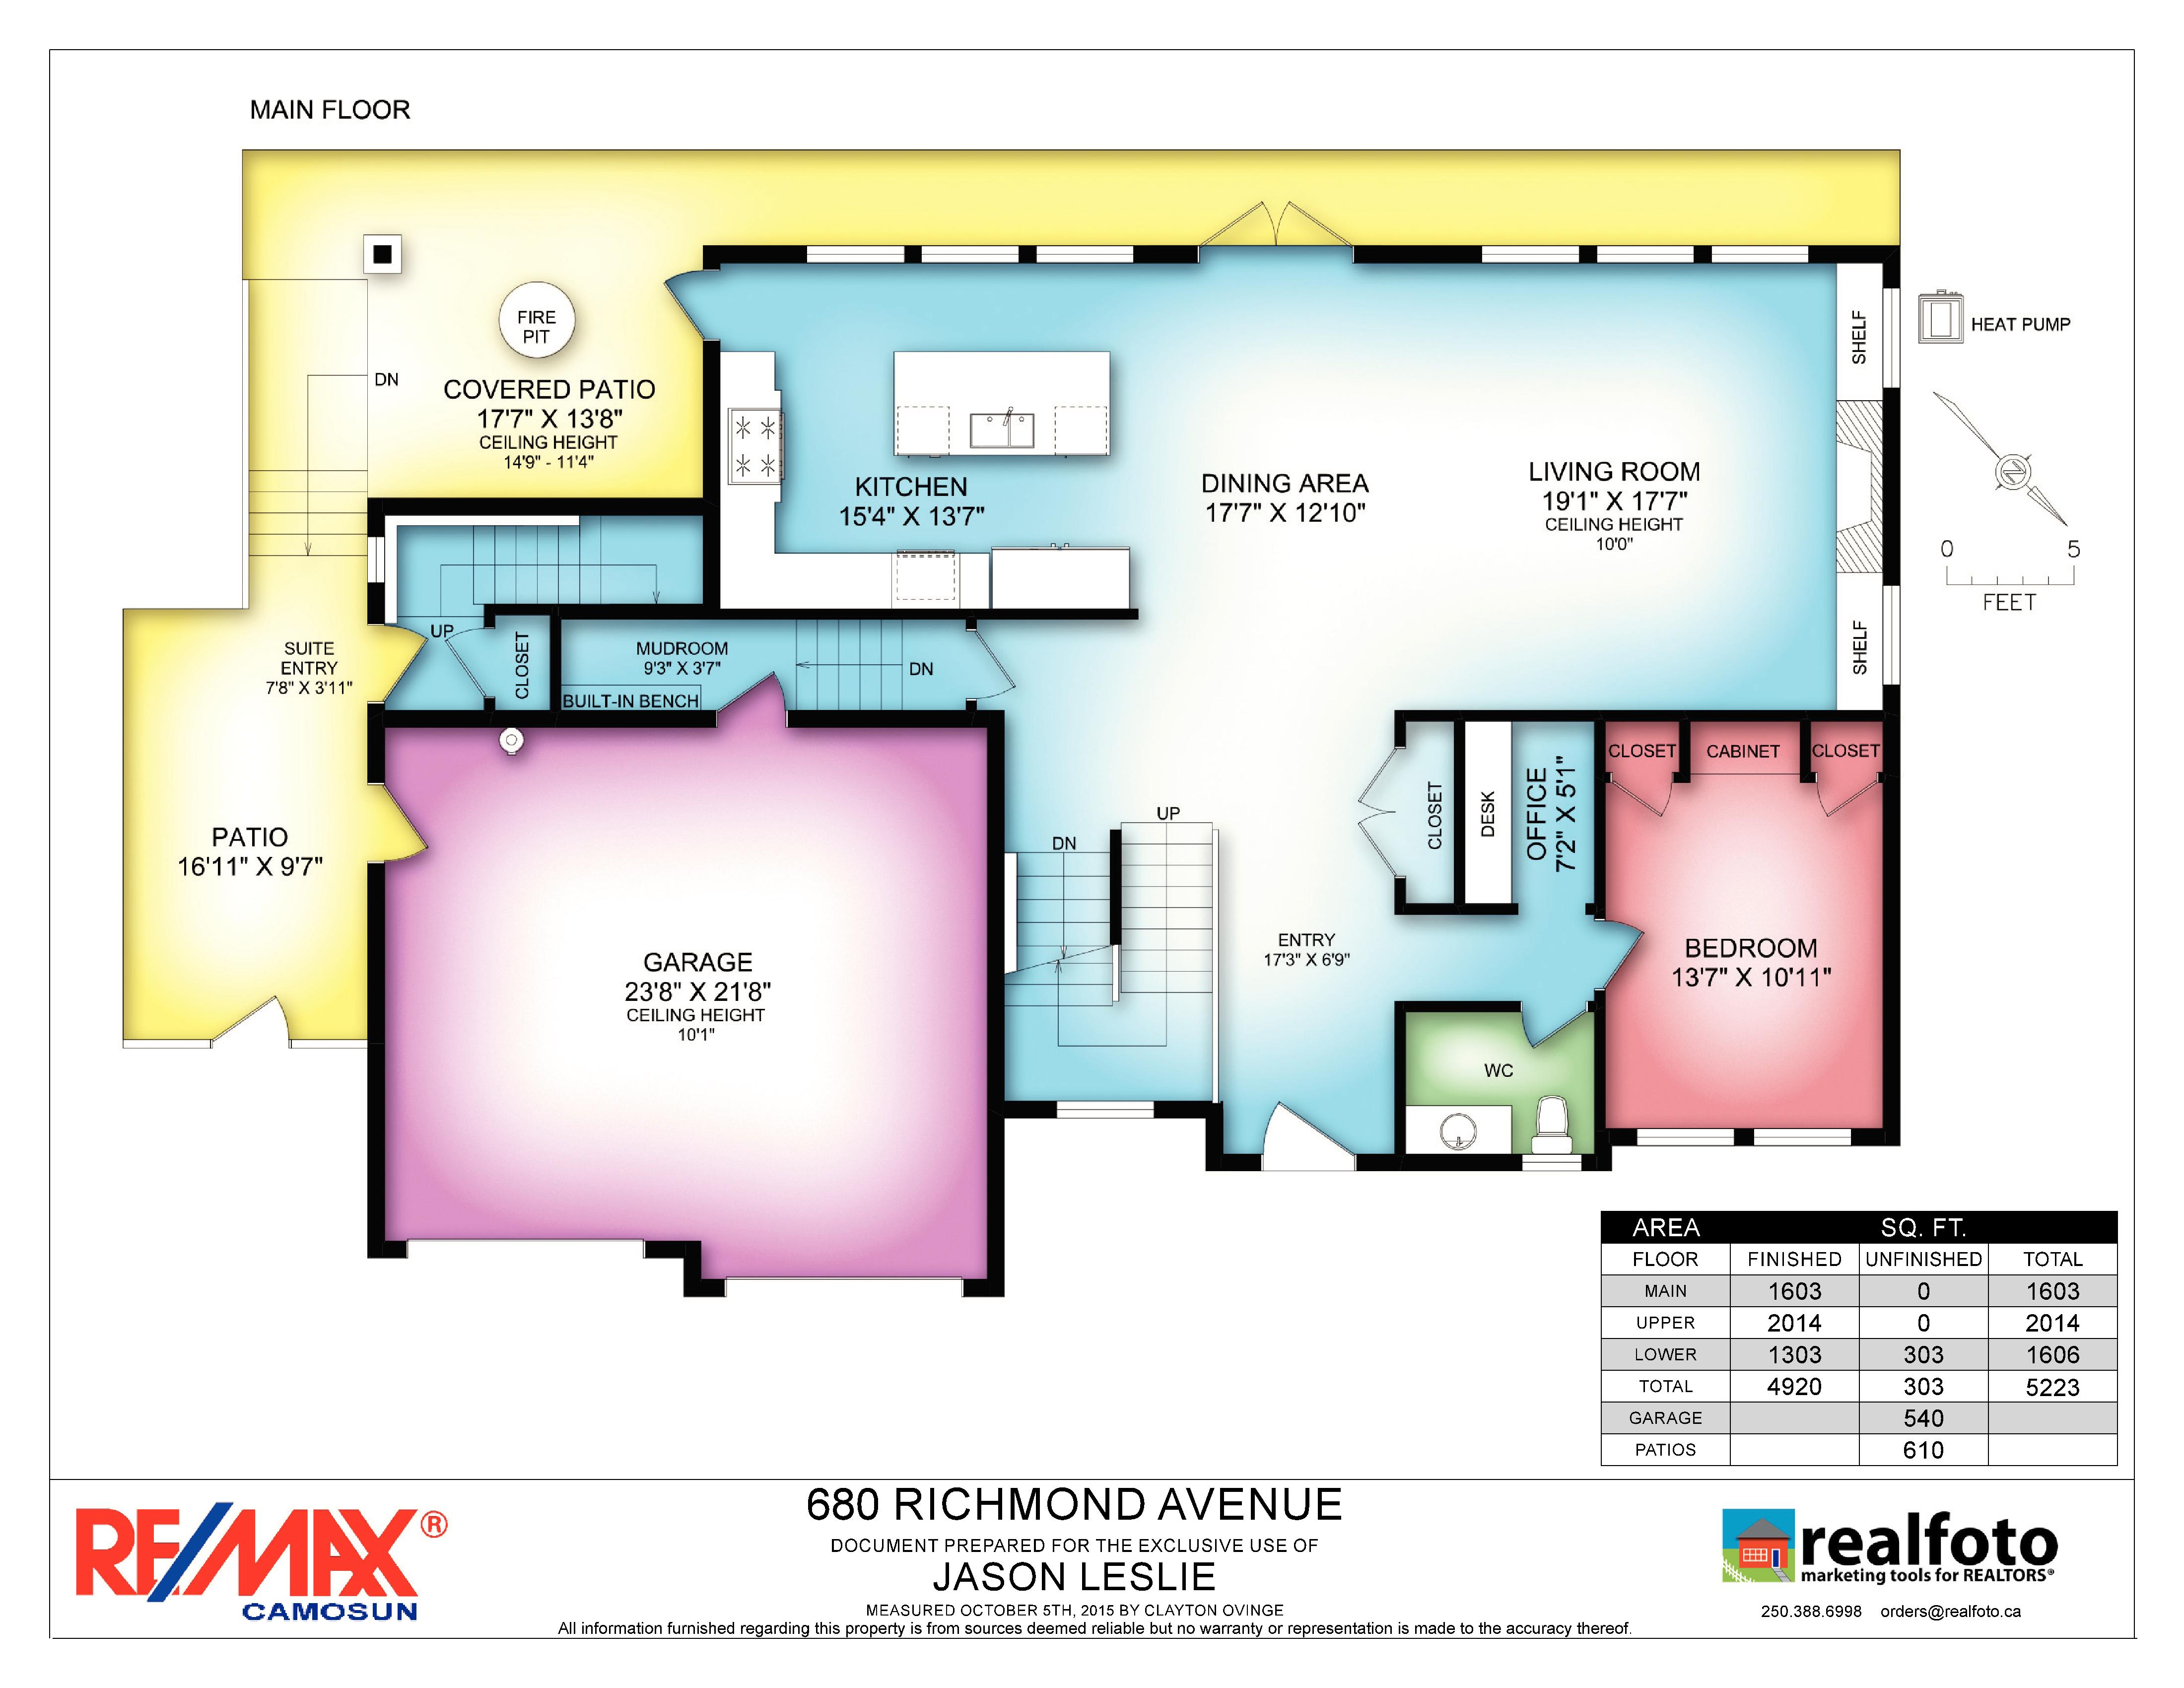 Floor plans for 680 richmond ave 0